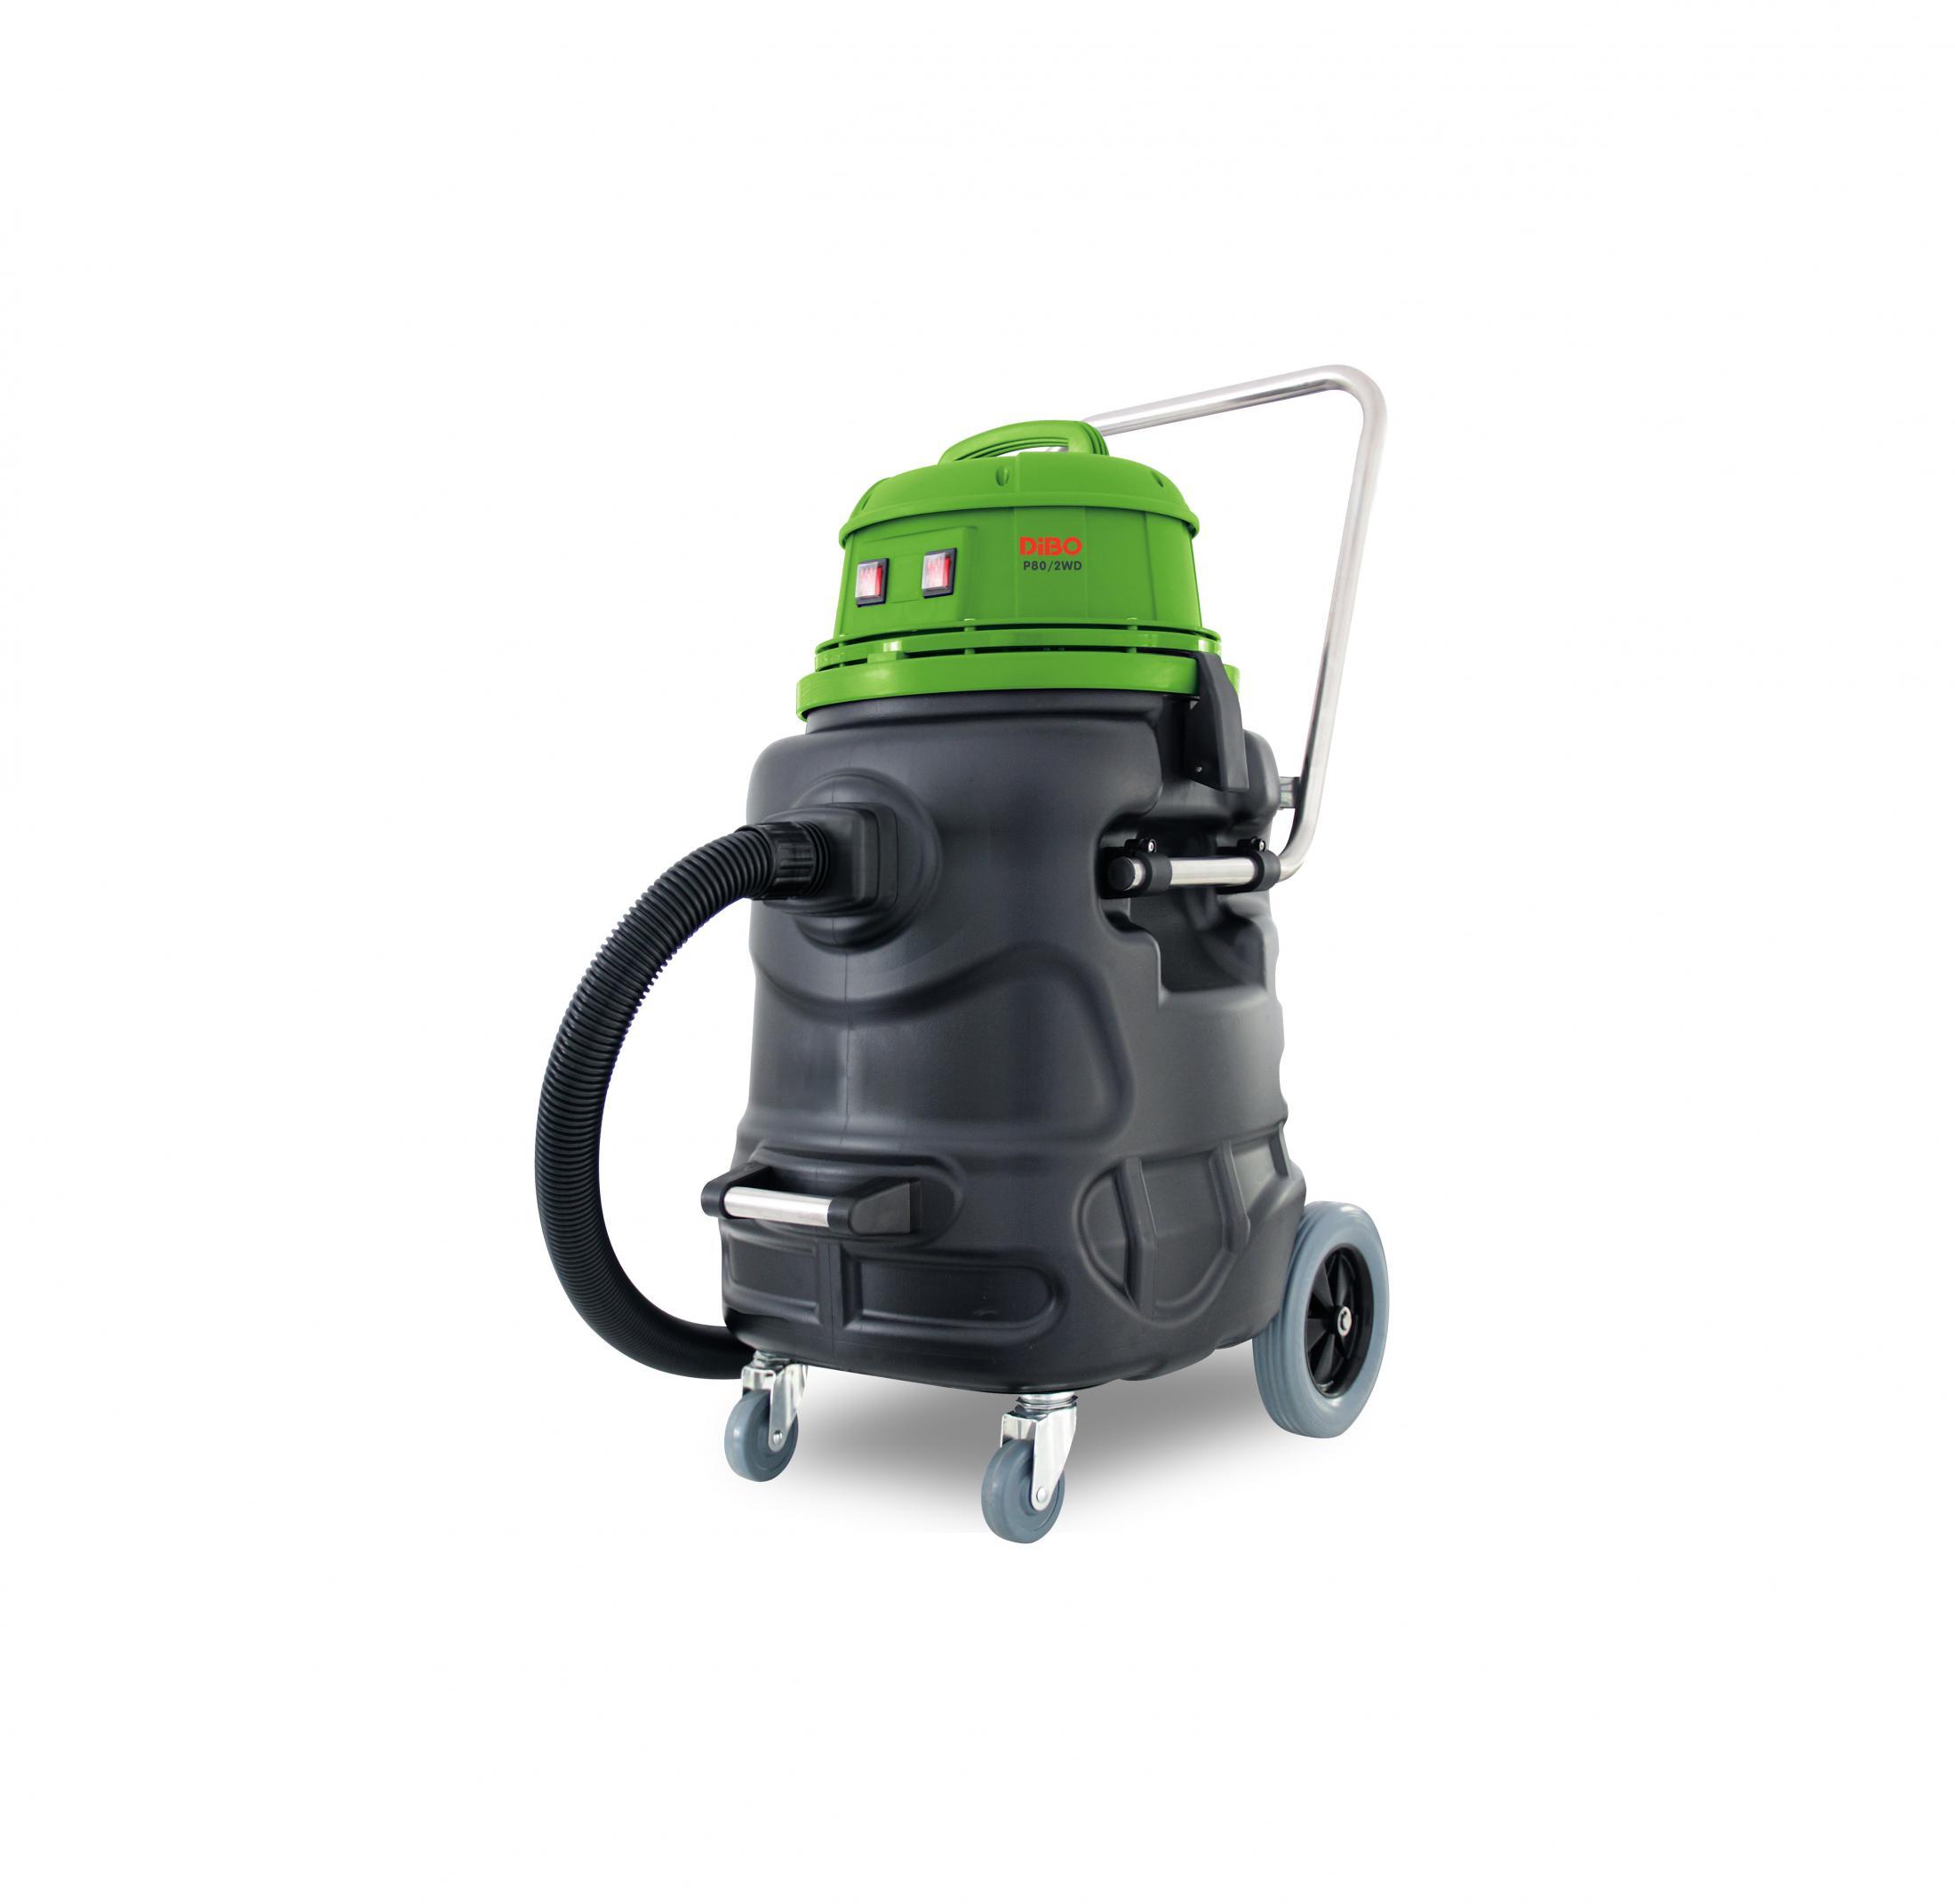 dibo-stofwaterzuiger-p80-2